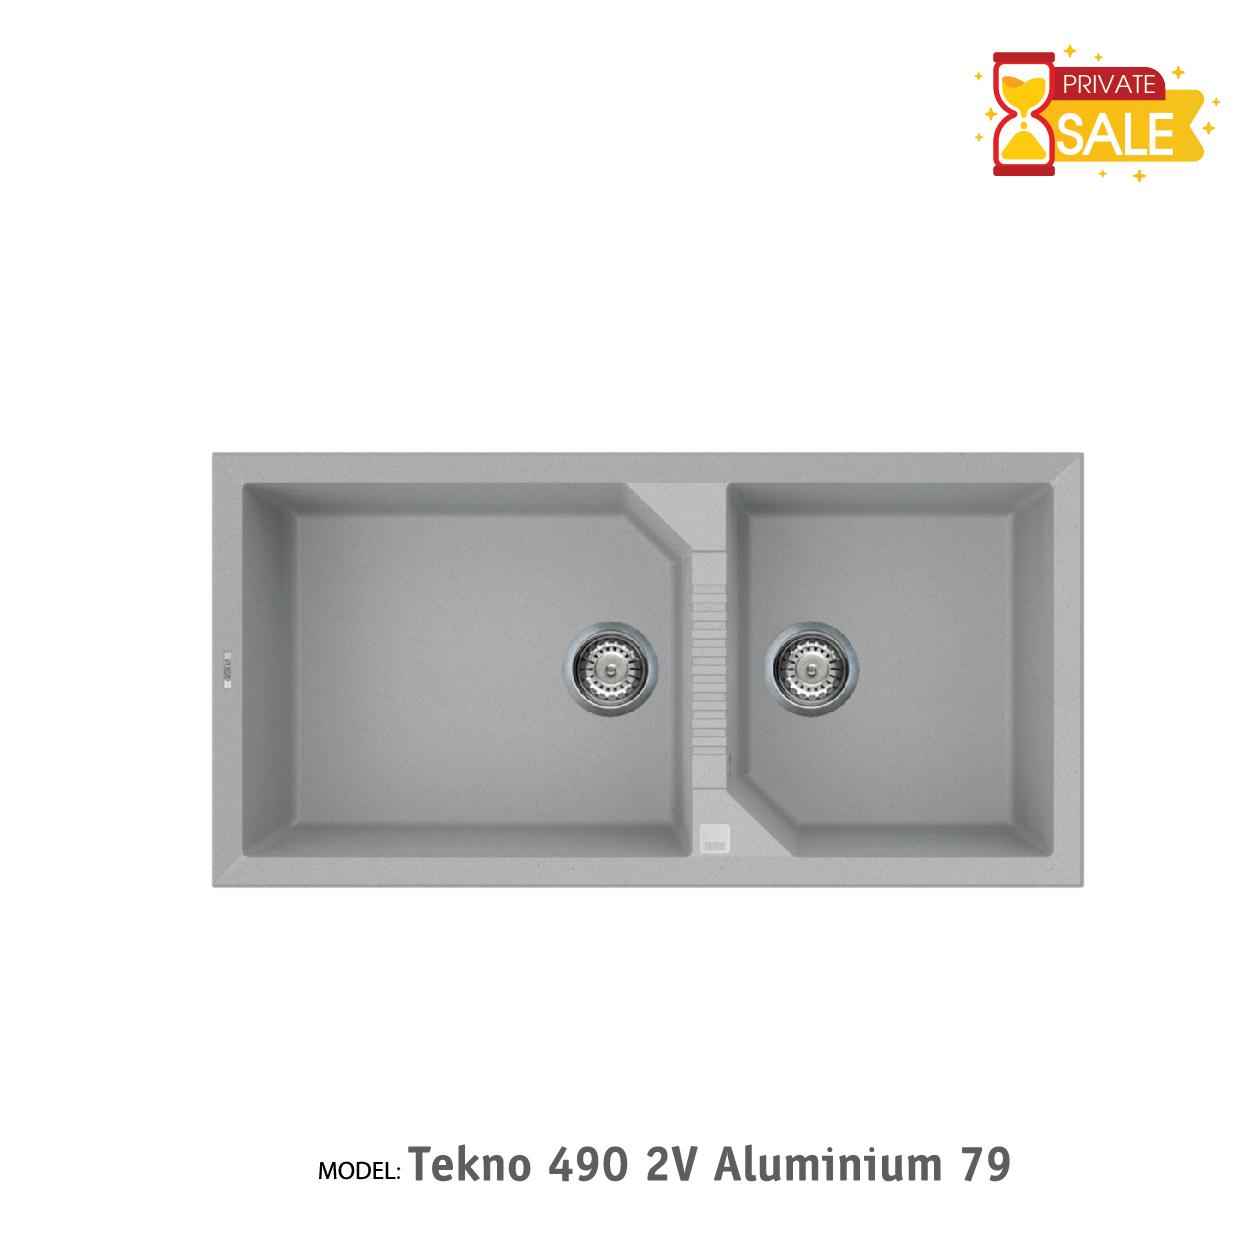 Chậu đá Elleci - Model Tekno 4902V Aluminium79